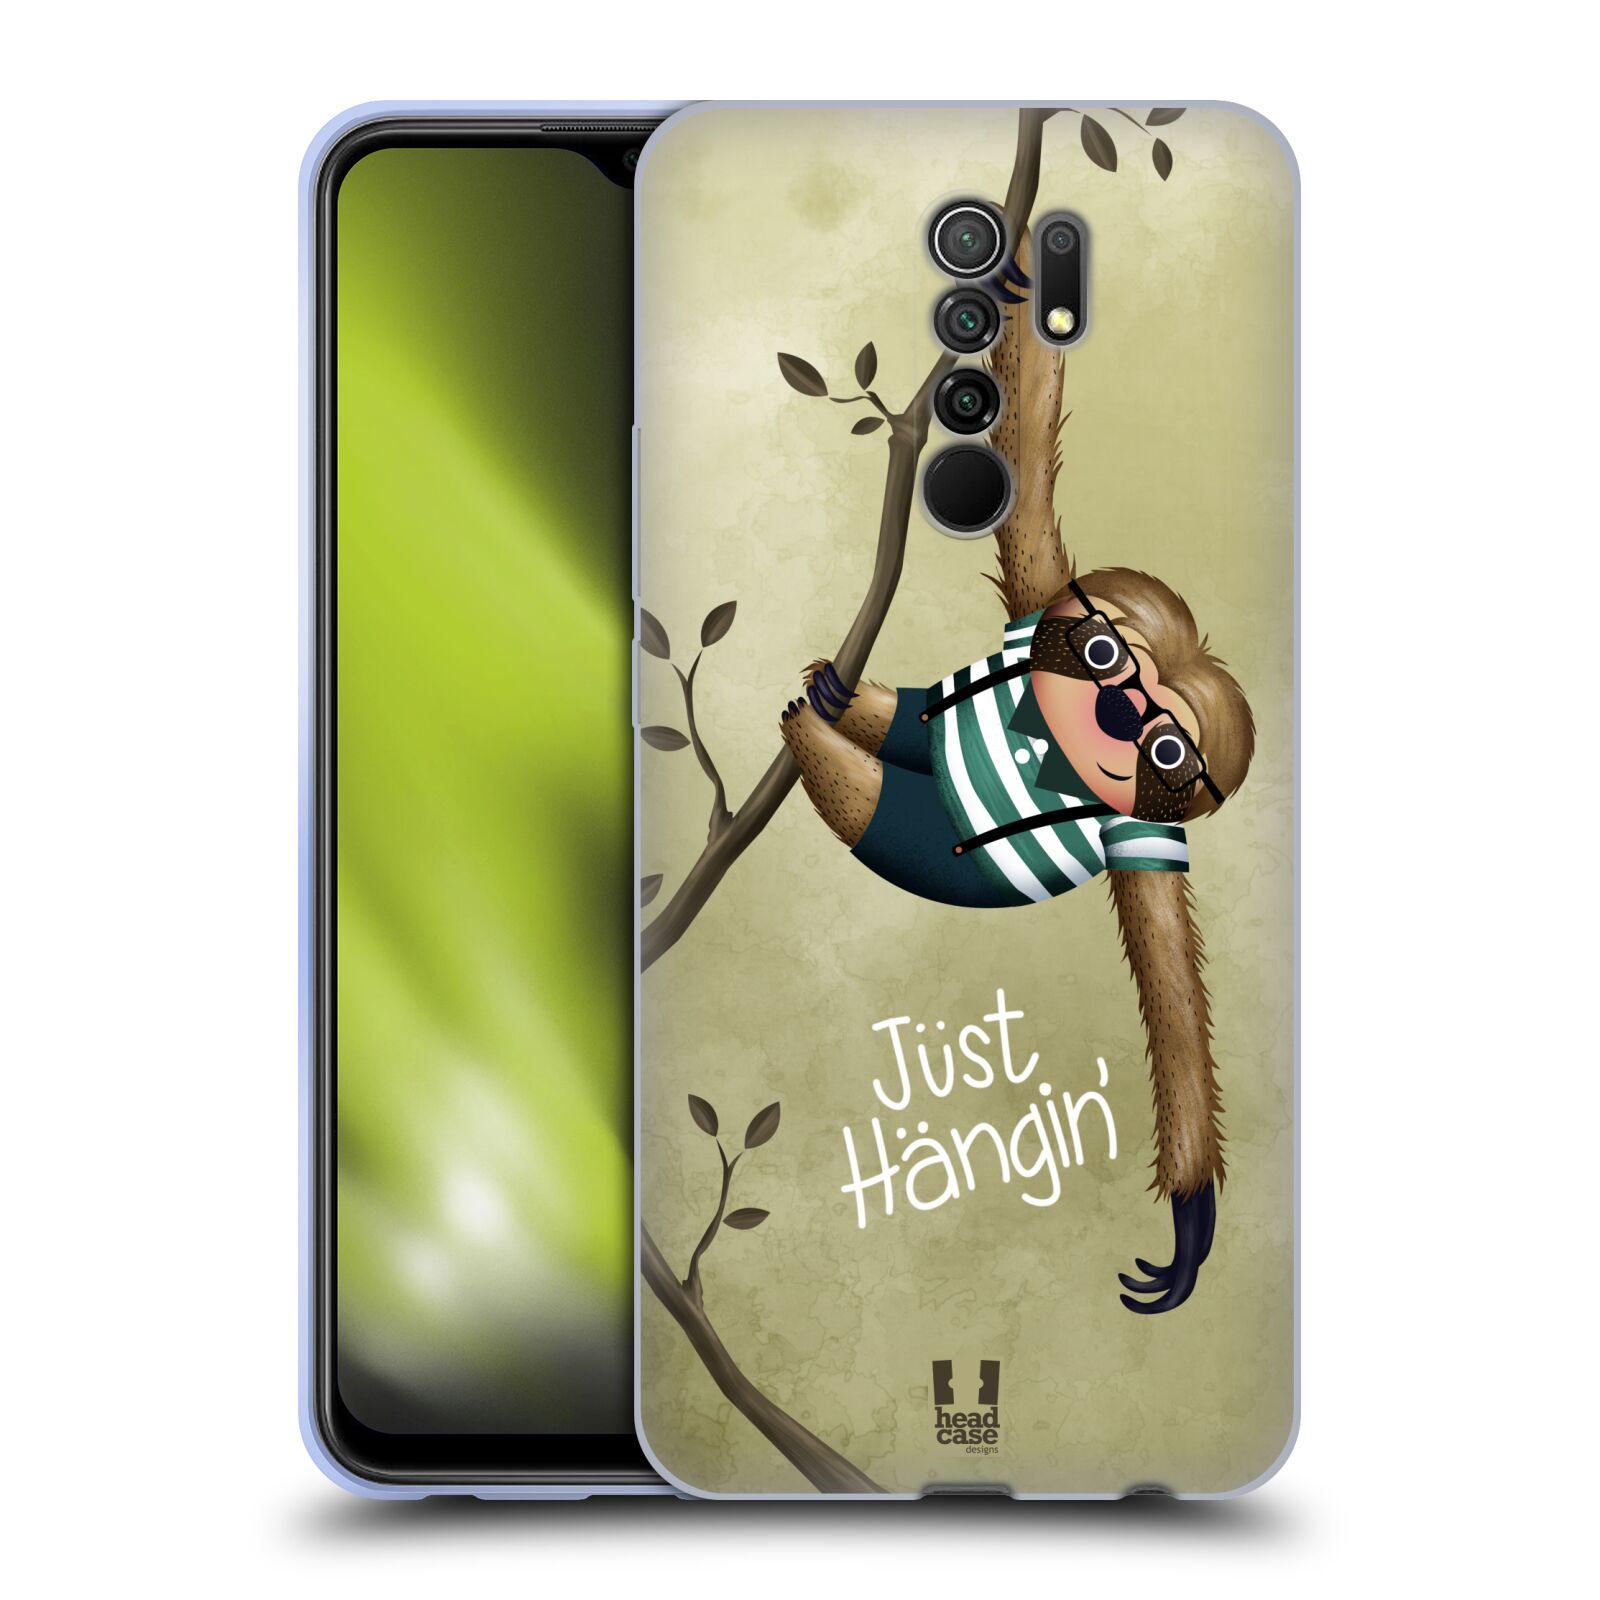 Silikonové pouzdro na mobil Xiaomi Redmi 9 - Head Case - Lenochod Just Hangin